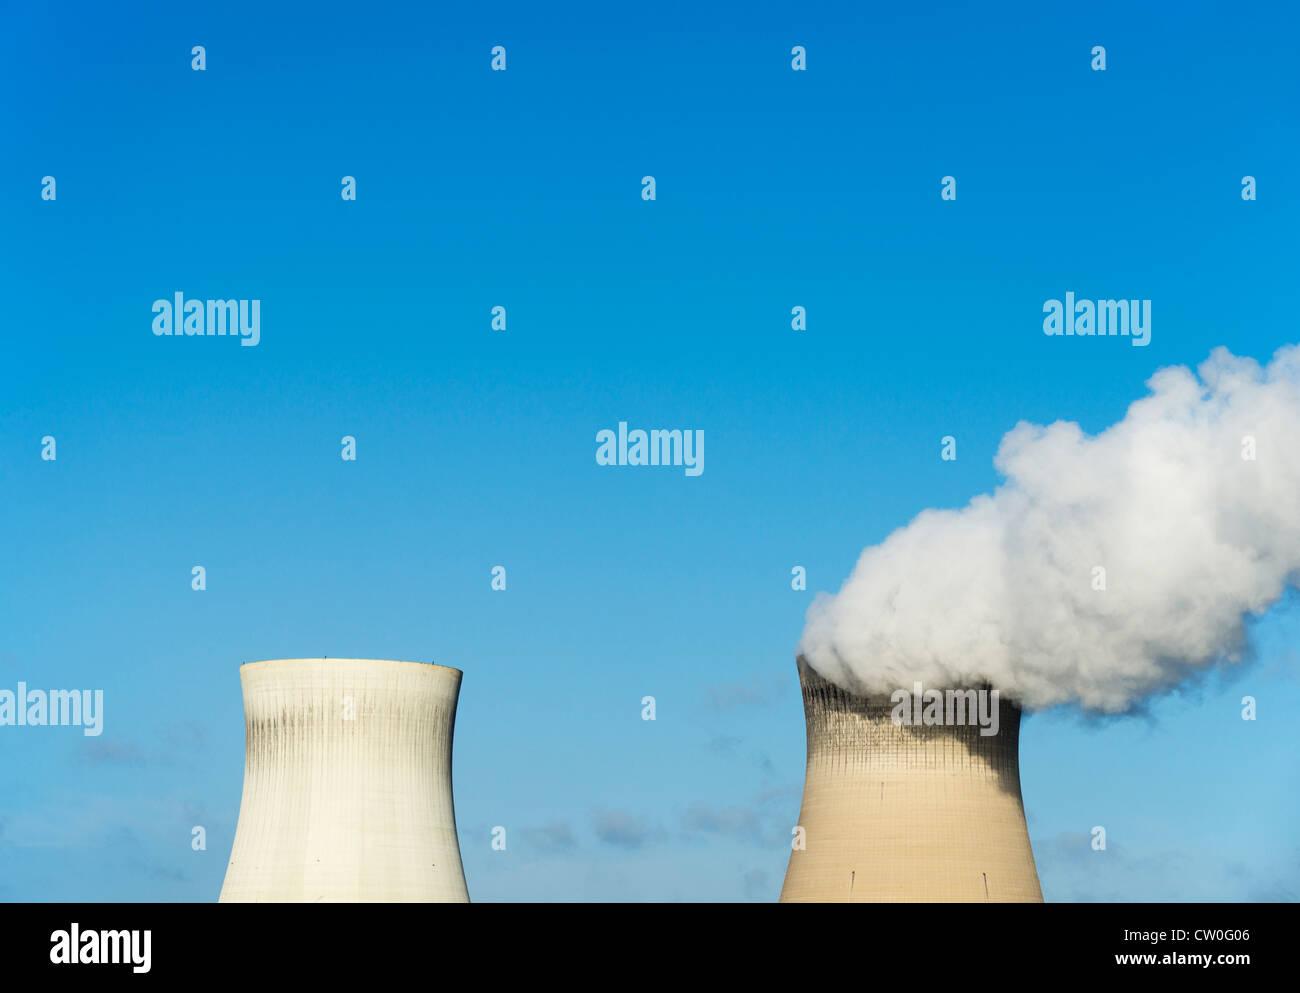 Smokestacks of nuclear power plant - Stock Image